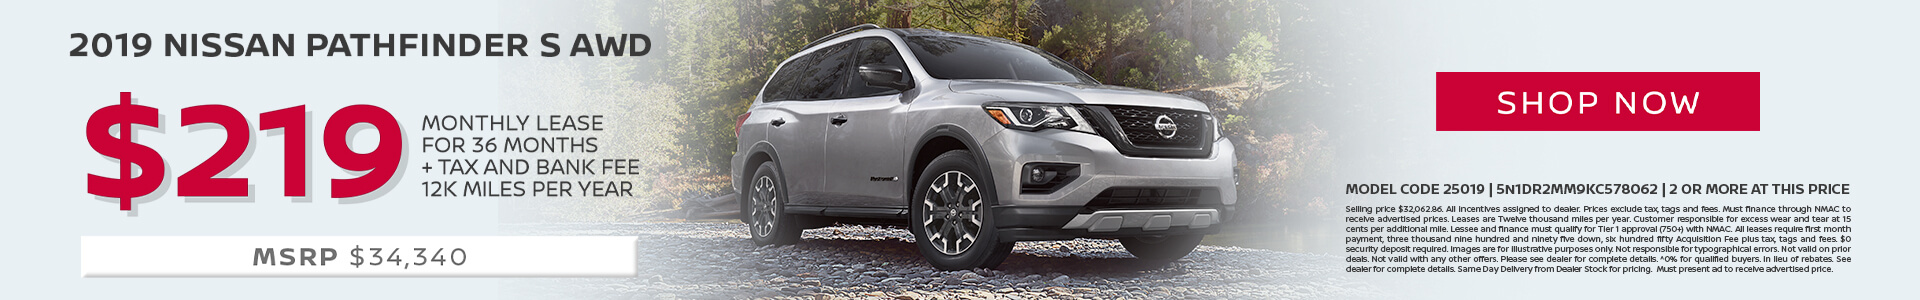 Nissan Pathfinder $219 Lease